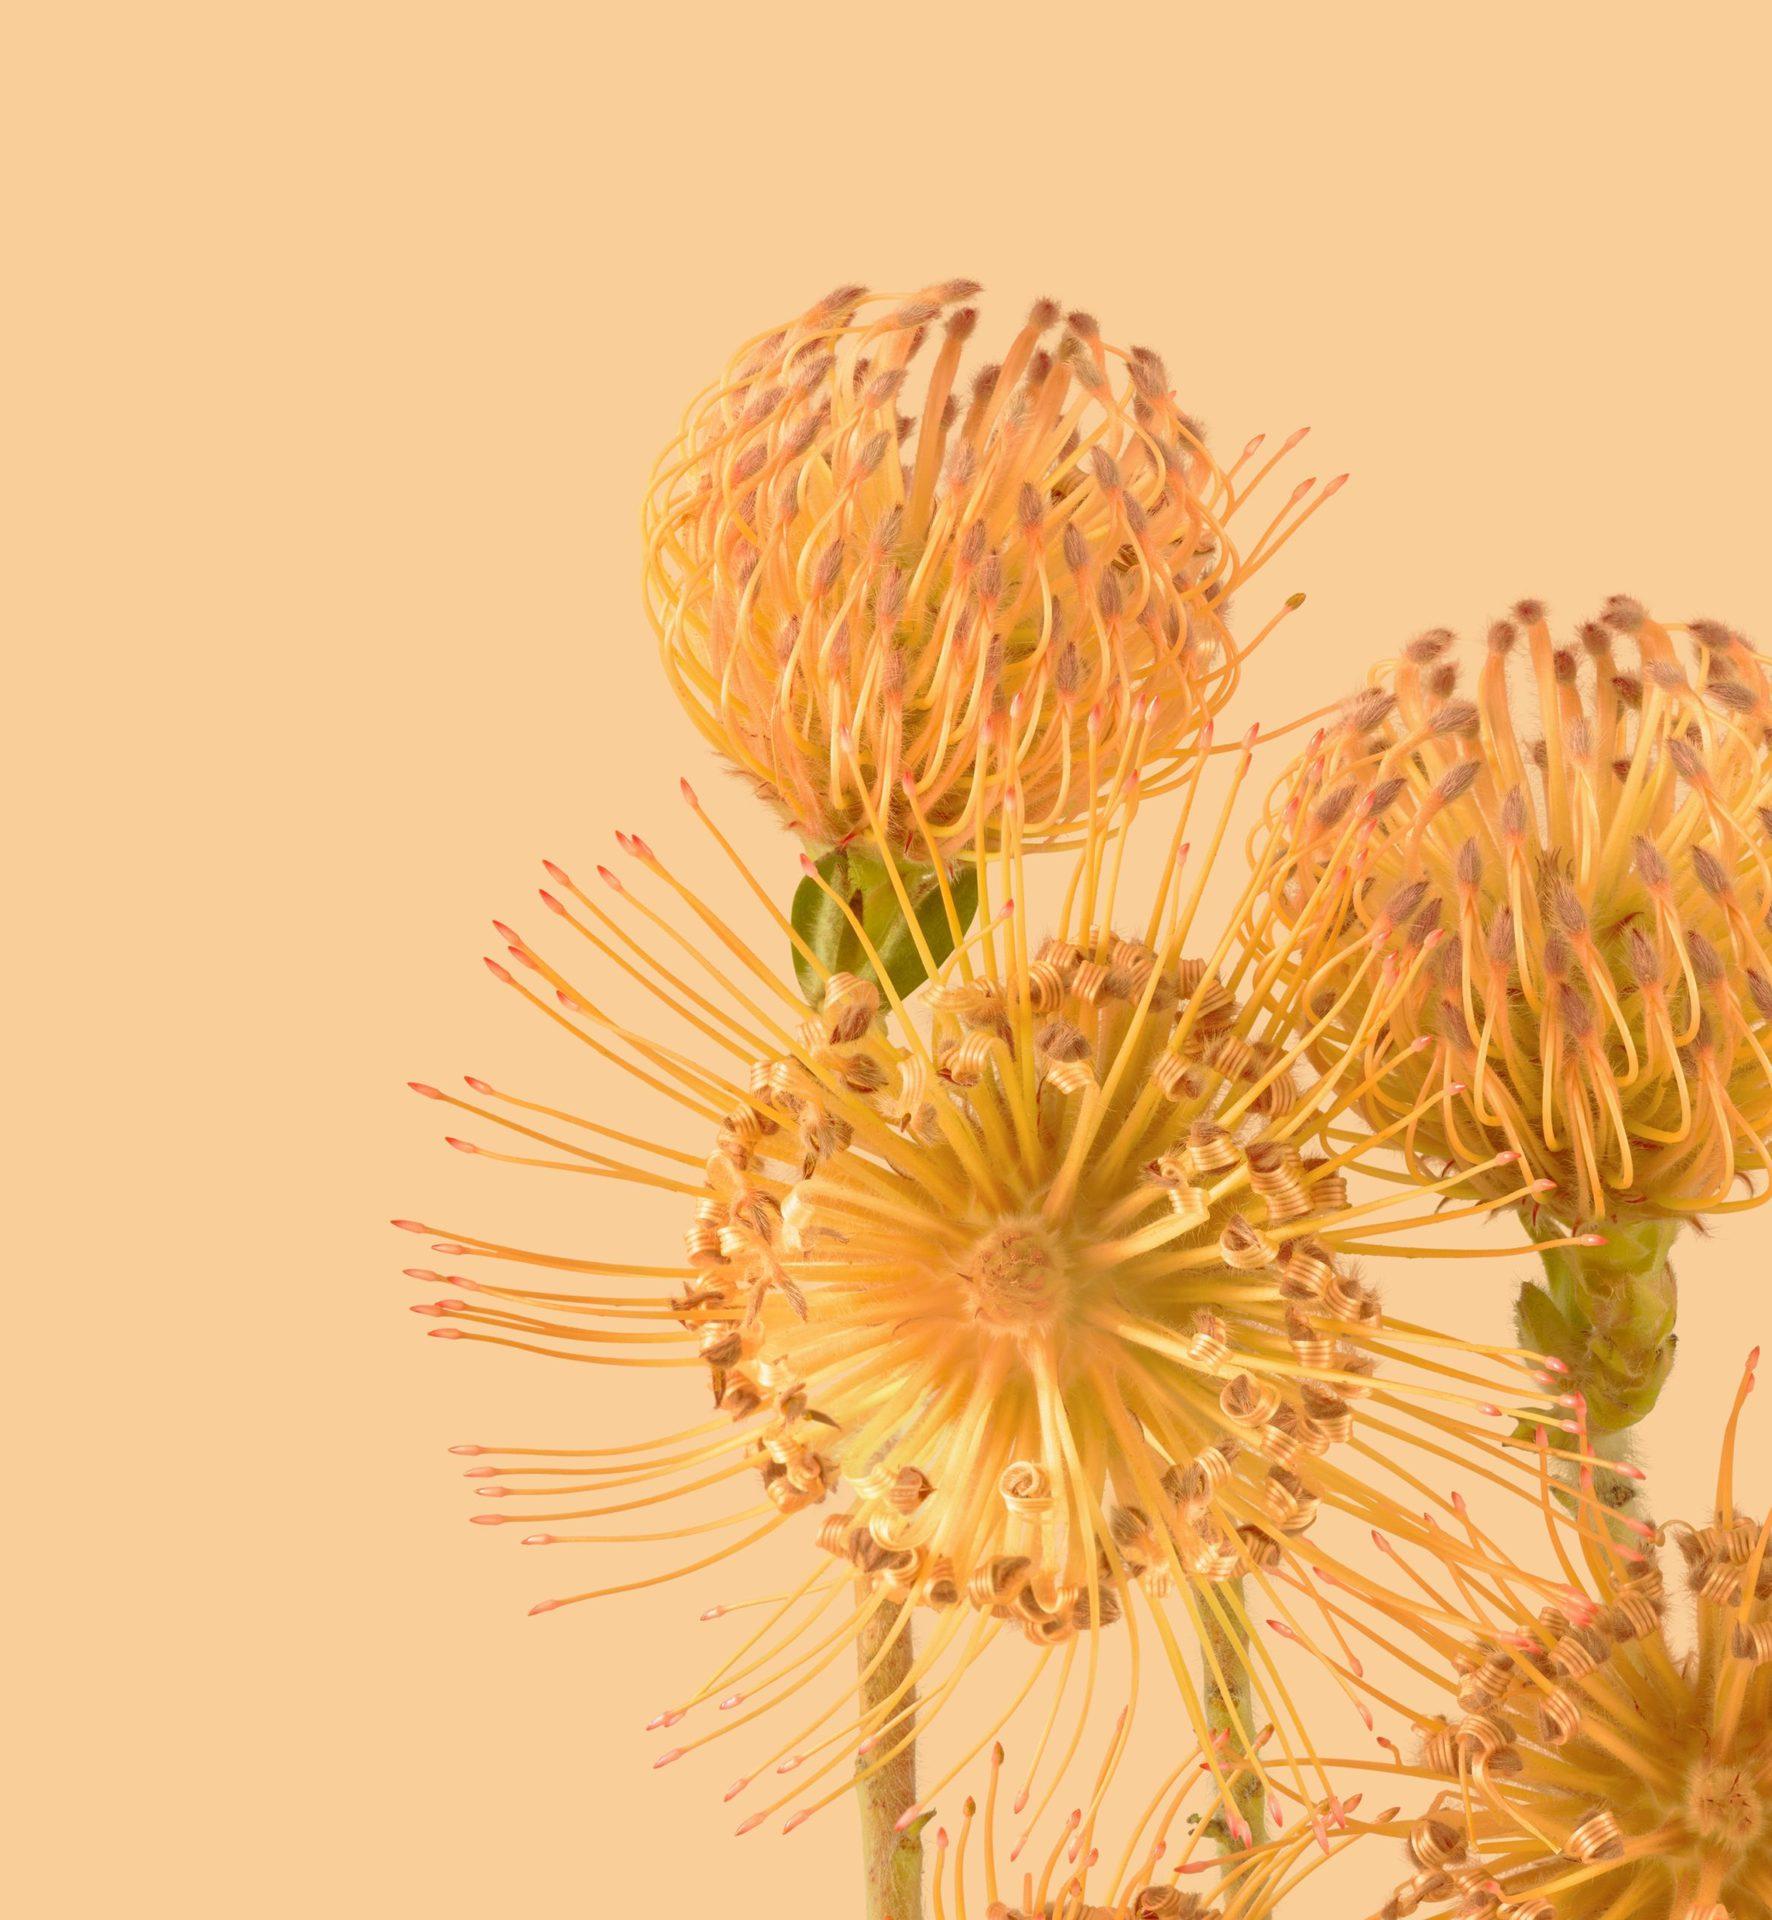 Pixel 6 Pro Wallpaper Pincushion Protea light by Andrew Zuckerman